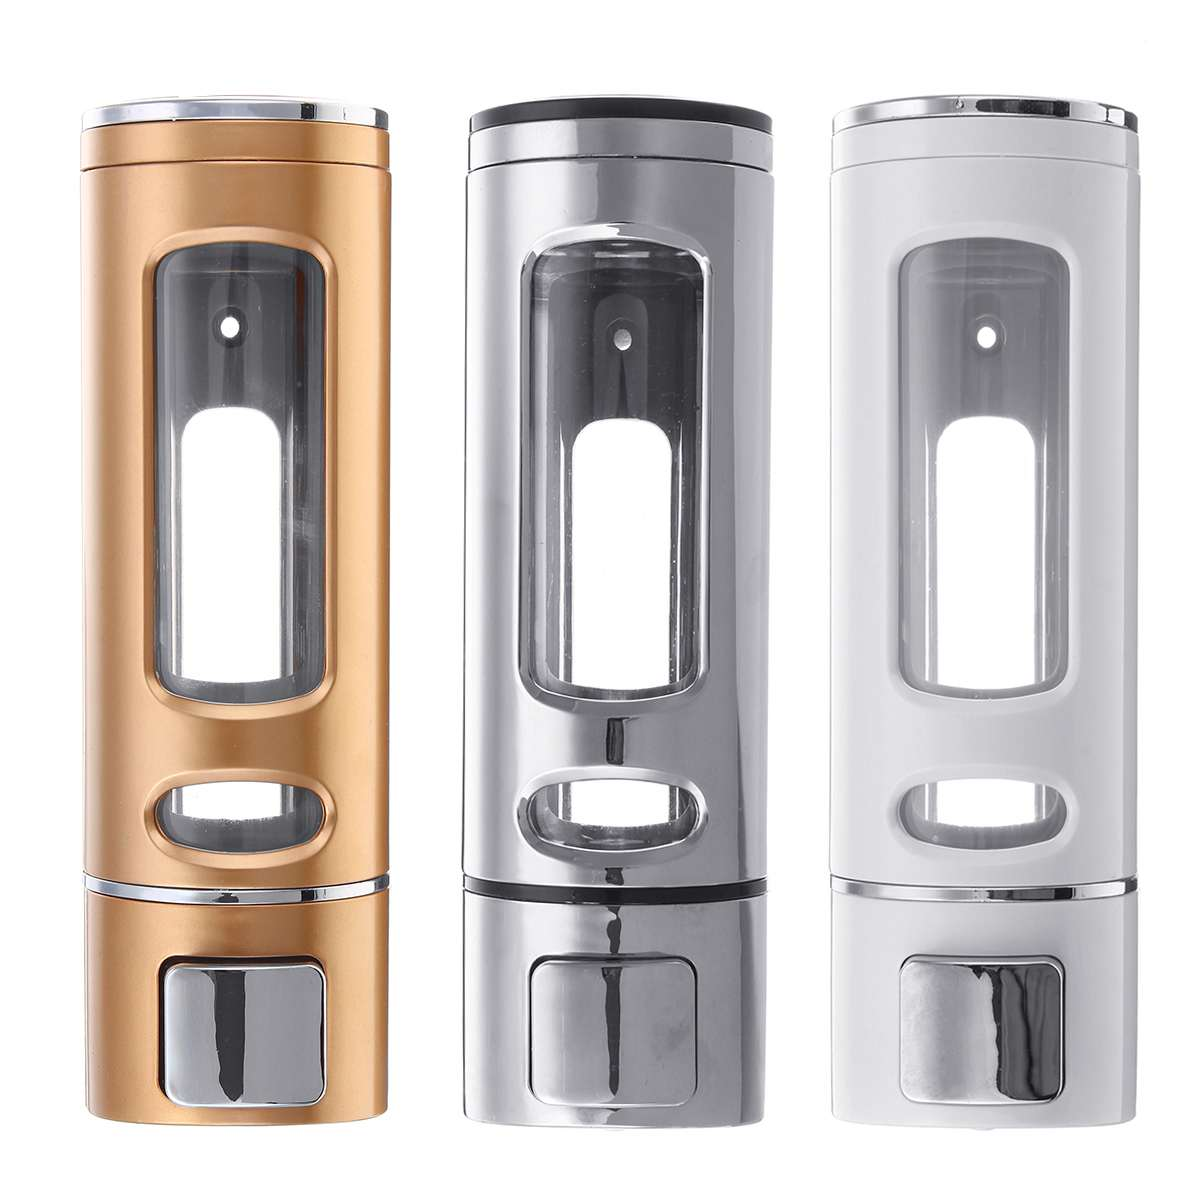 400ml Wall Mount Liquid Soap Dispenser Plastic Kitchen Bathroom Shampoo Dispensers Liquid Soap Container Bathroom Accessories